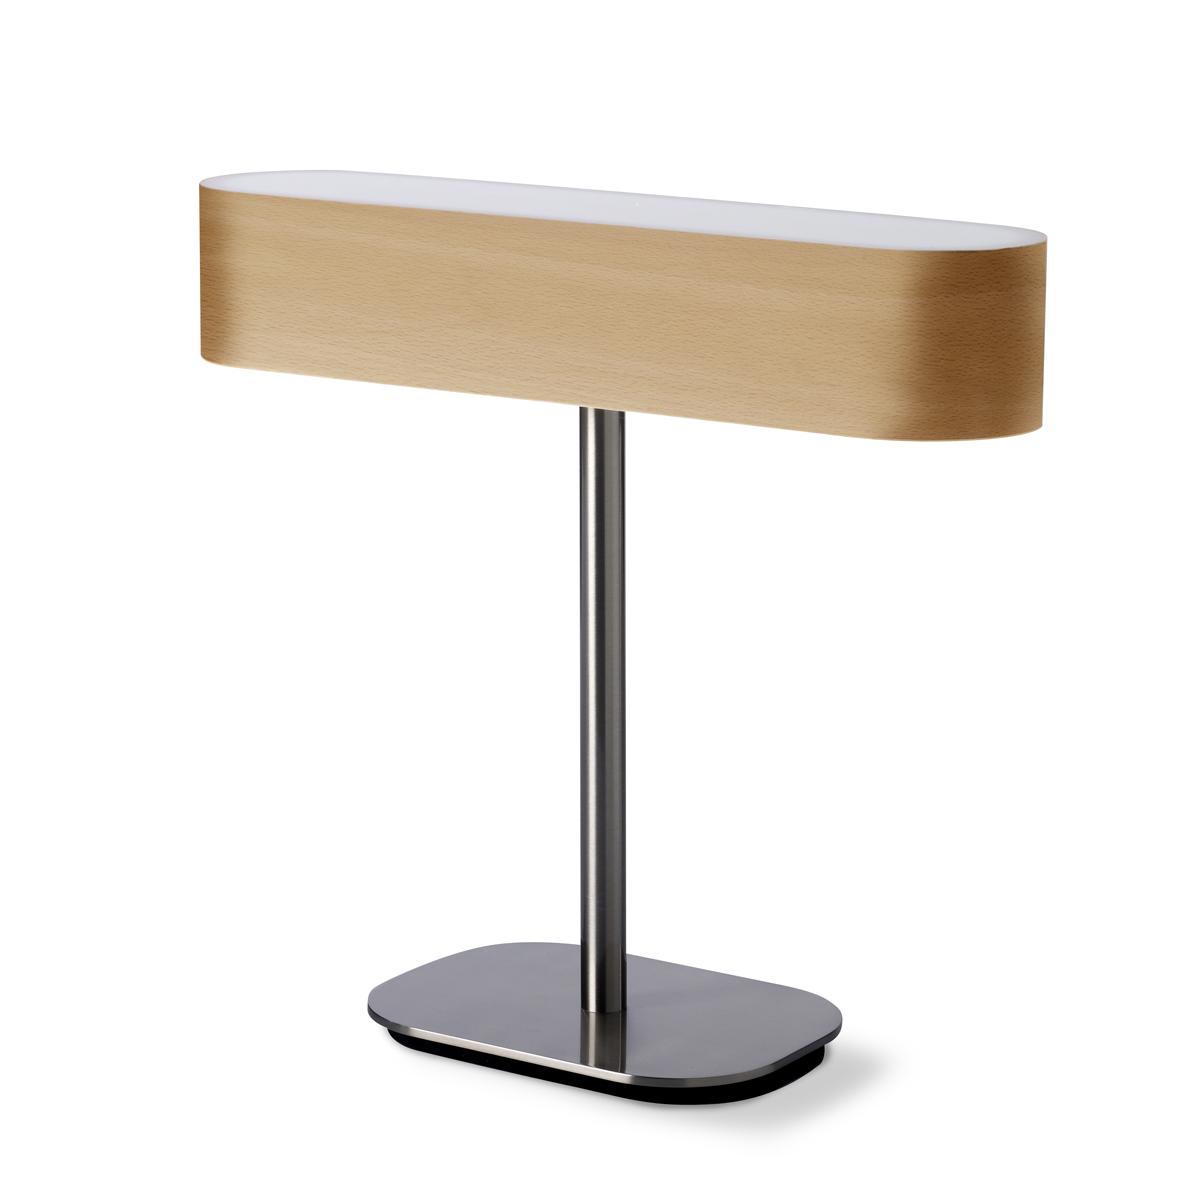 LZF Lamps I-Club LED Tischleuchte I M LED DIM 22